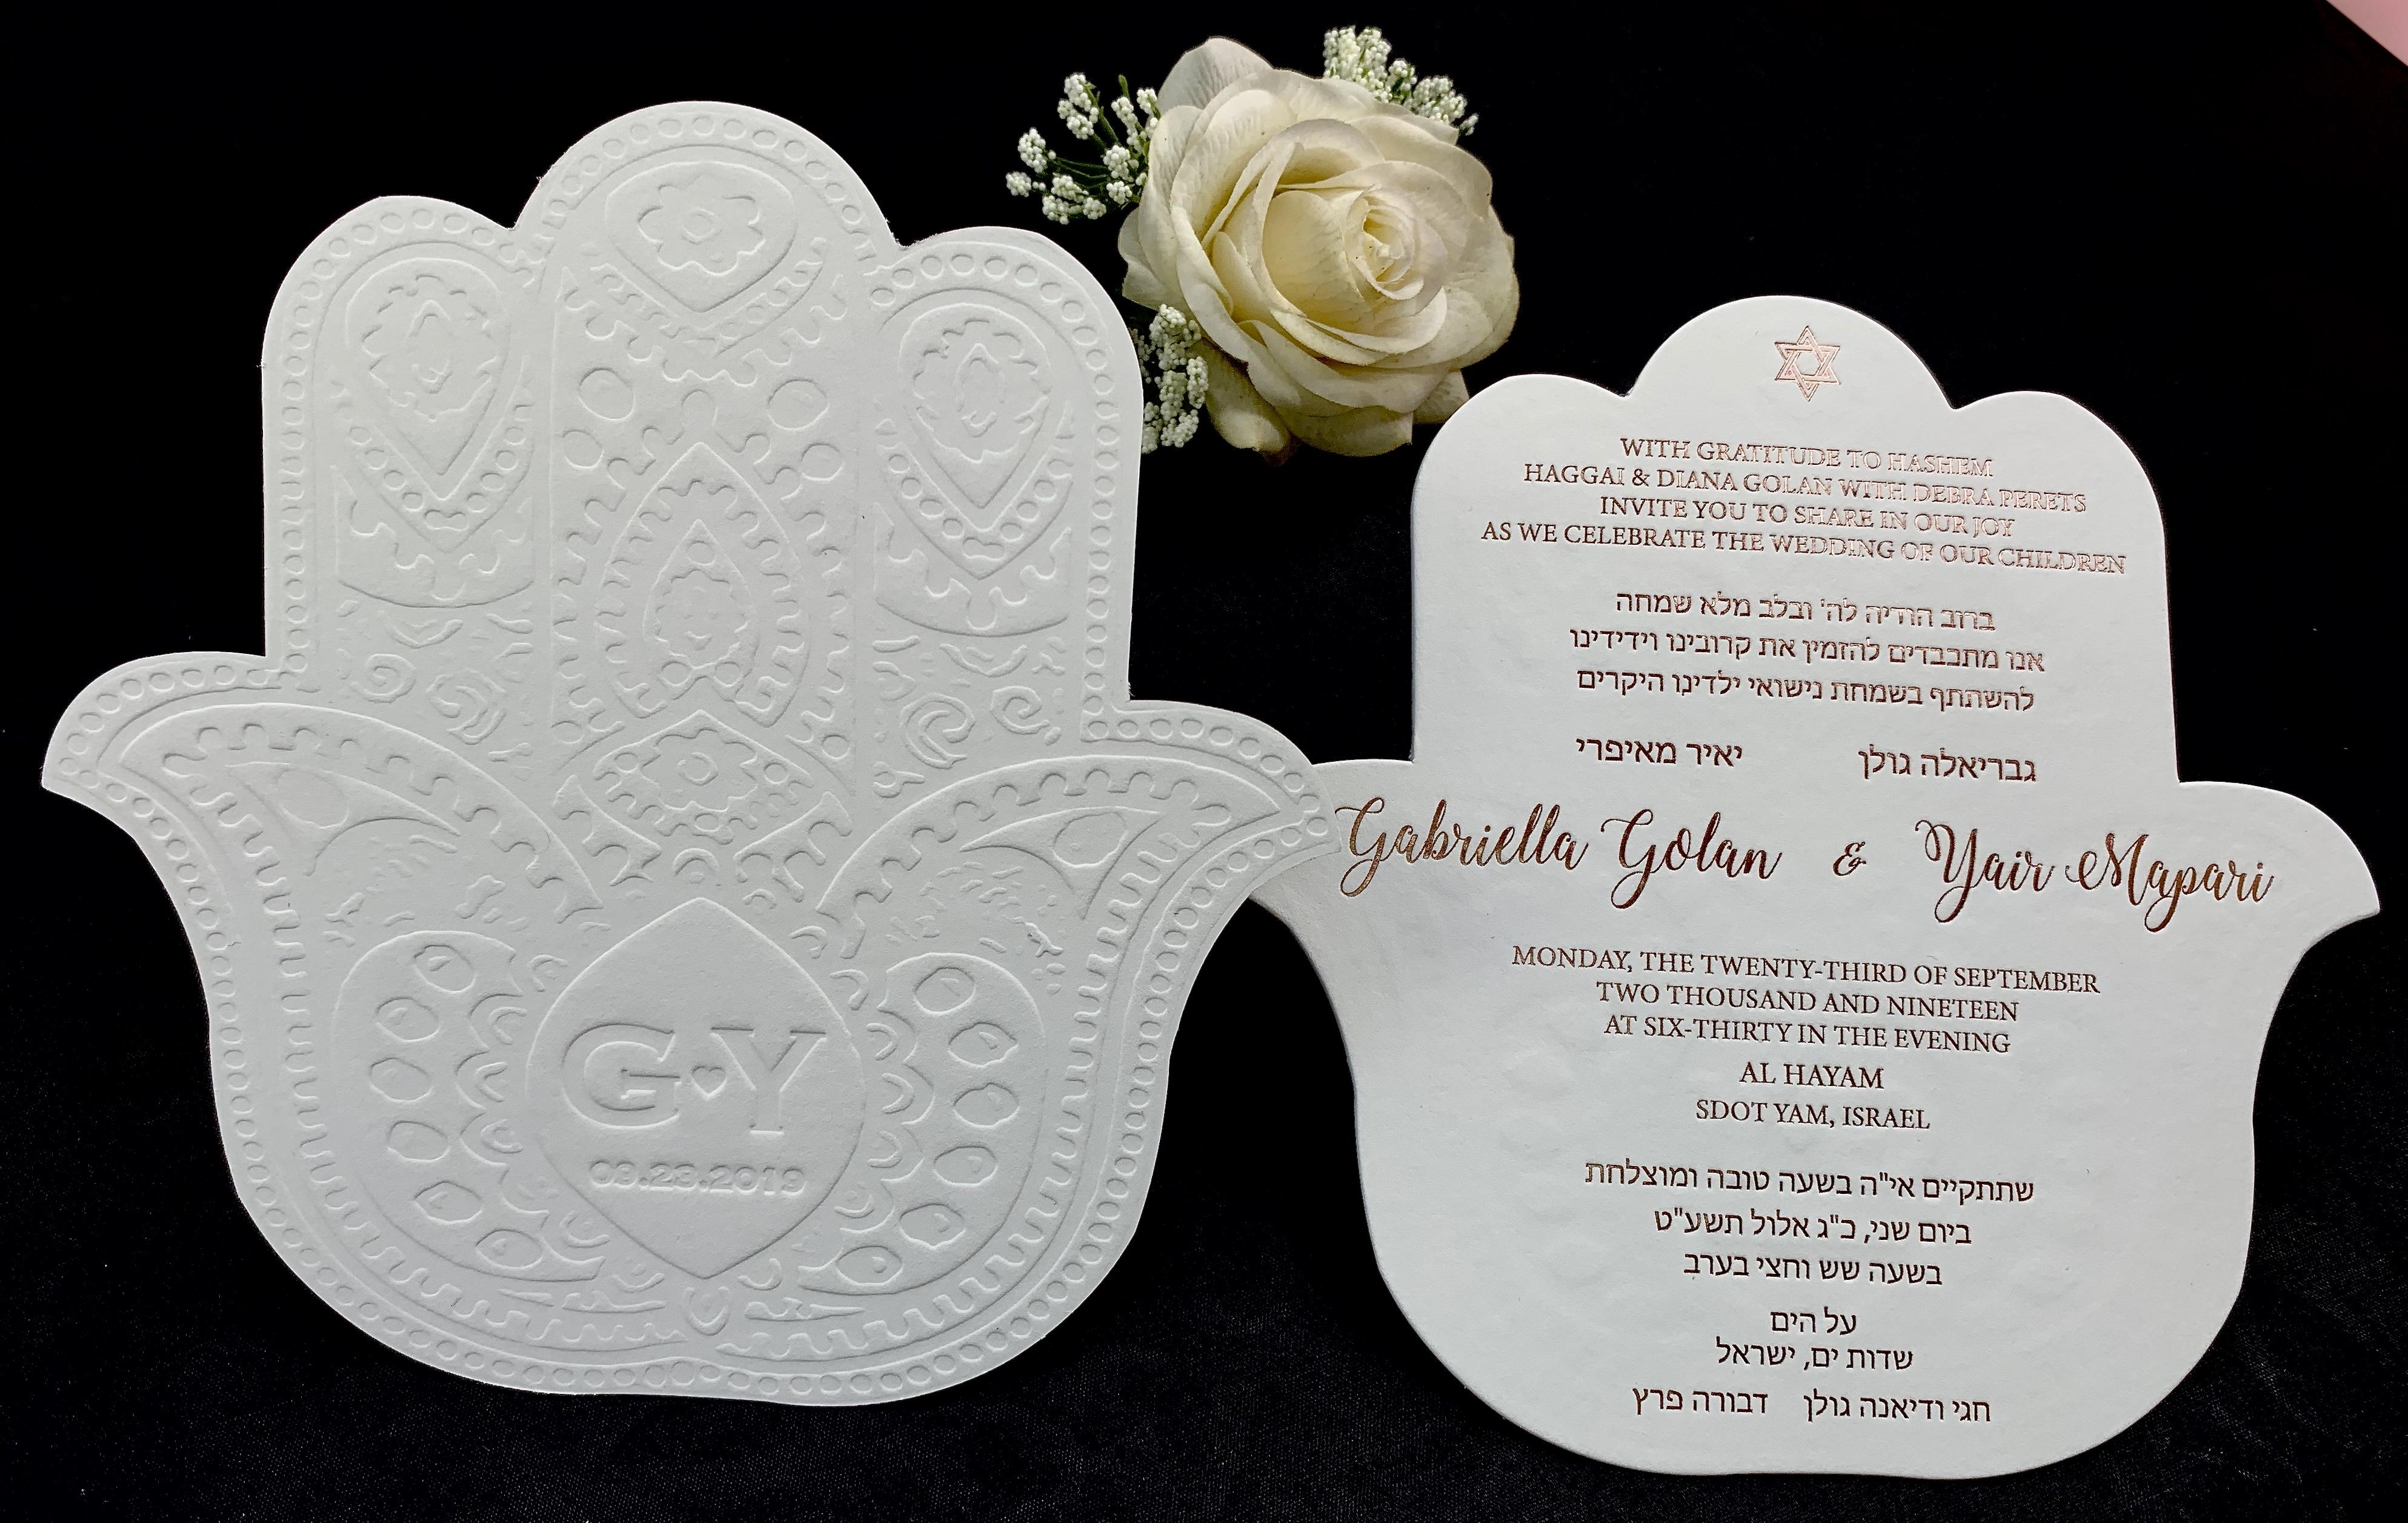 Hebrew wedding invitations in NYC